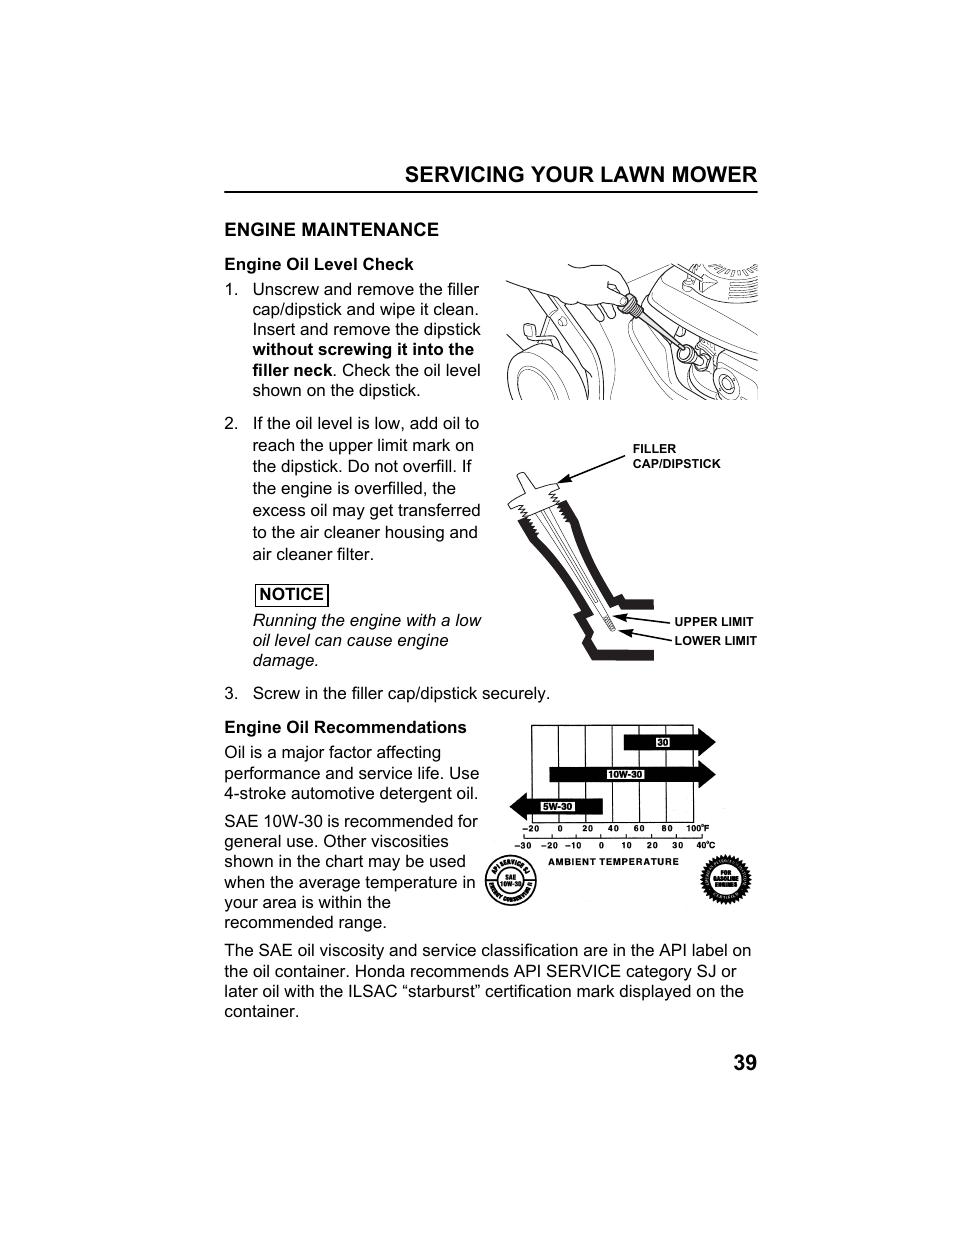 Engine maintenance, Engine oil level check, Engine oil